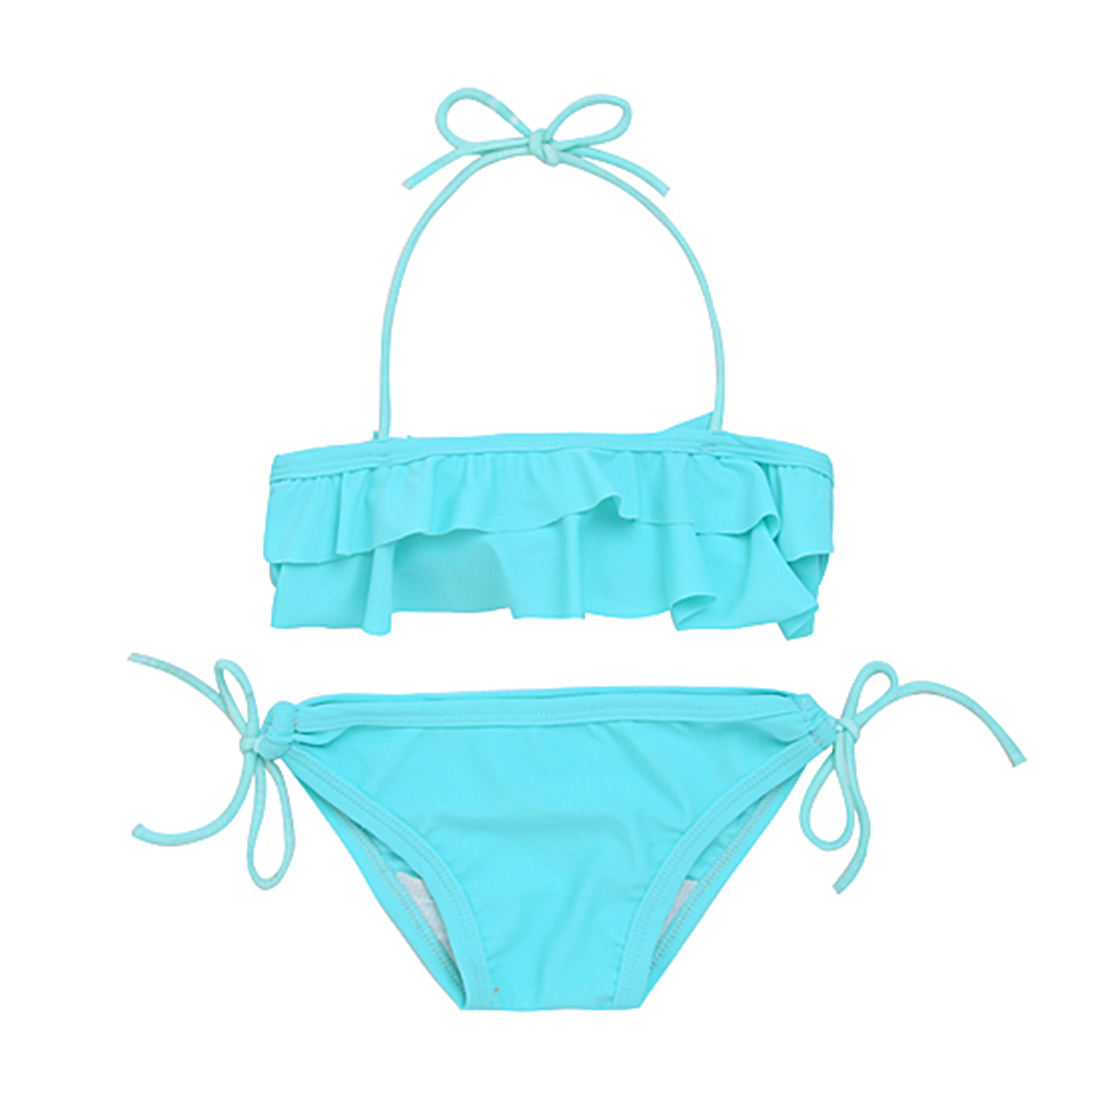 Kids Swimwear Baby Girls Fashion Bikini Suit Set Swimsuit Swimwear ...